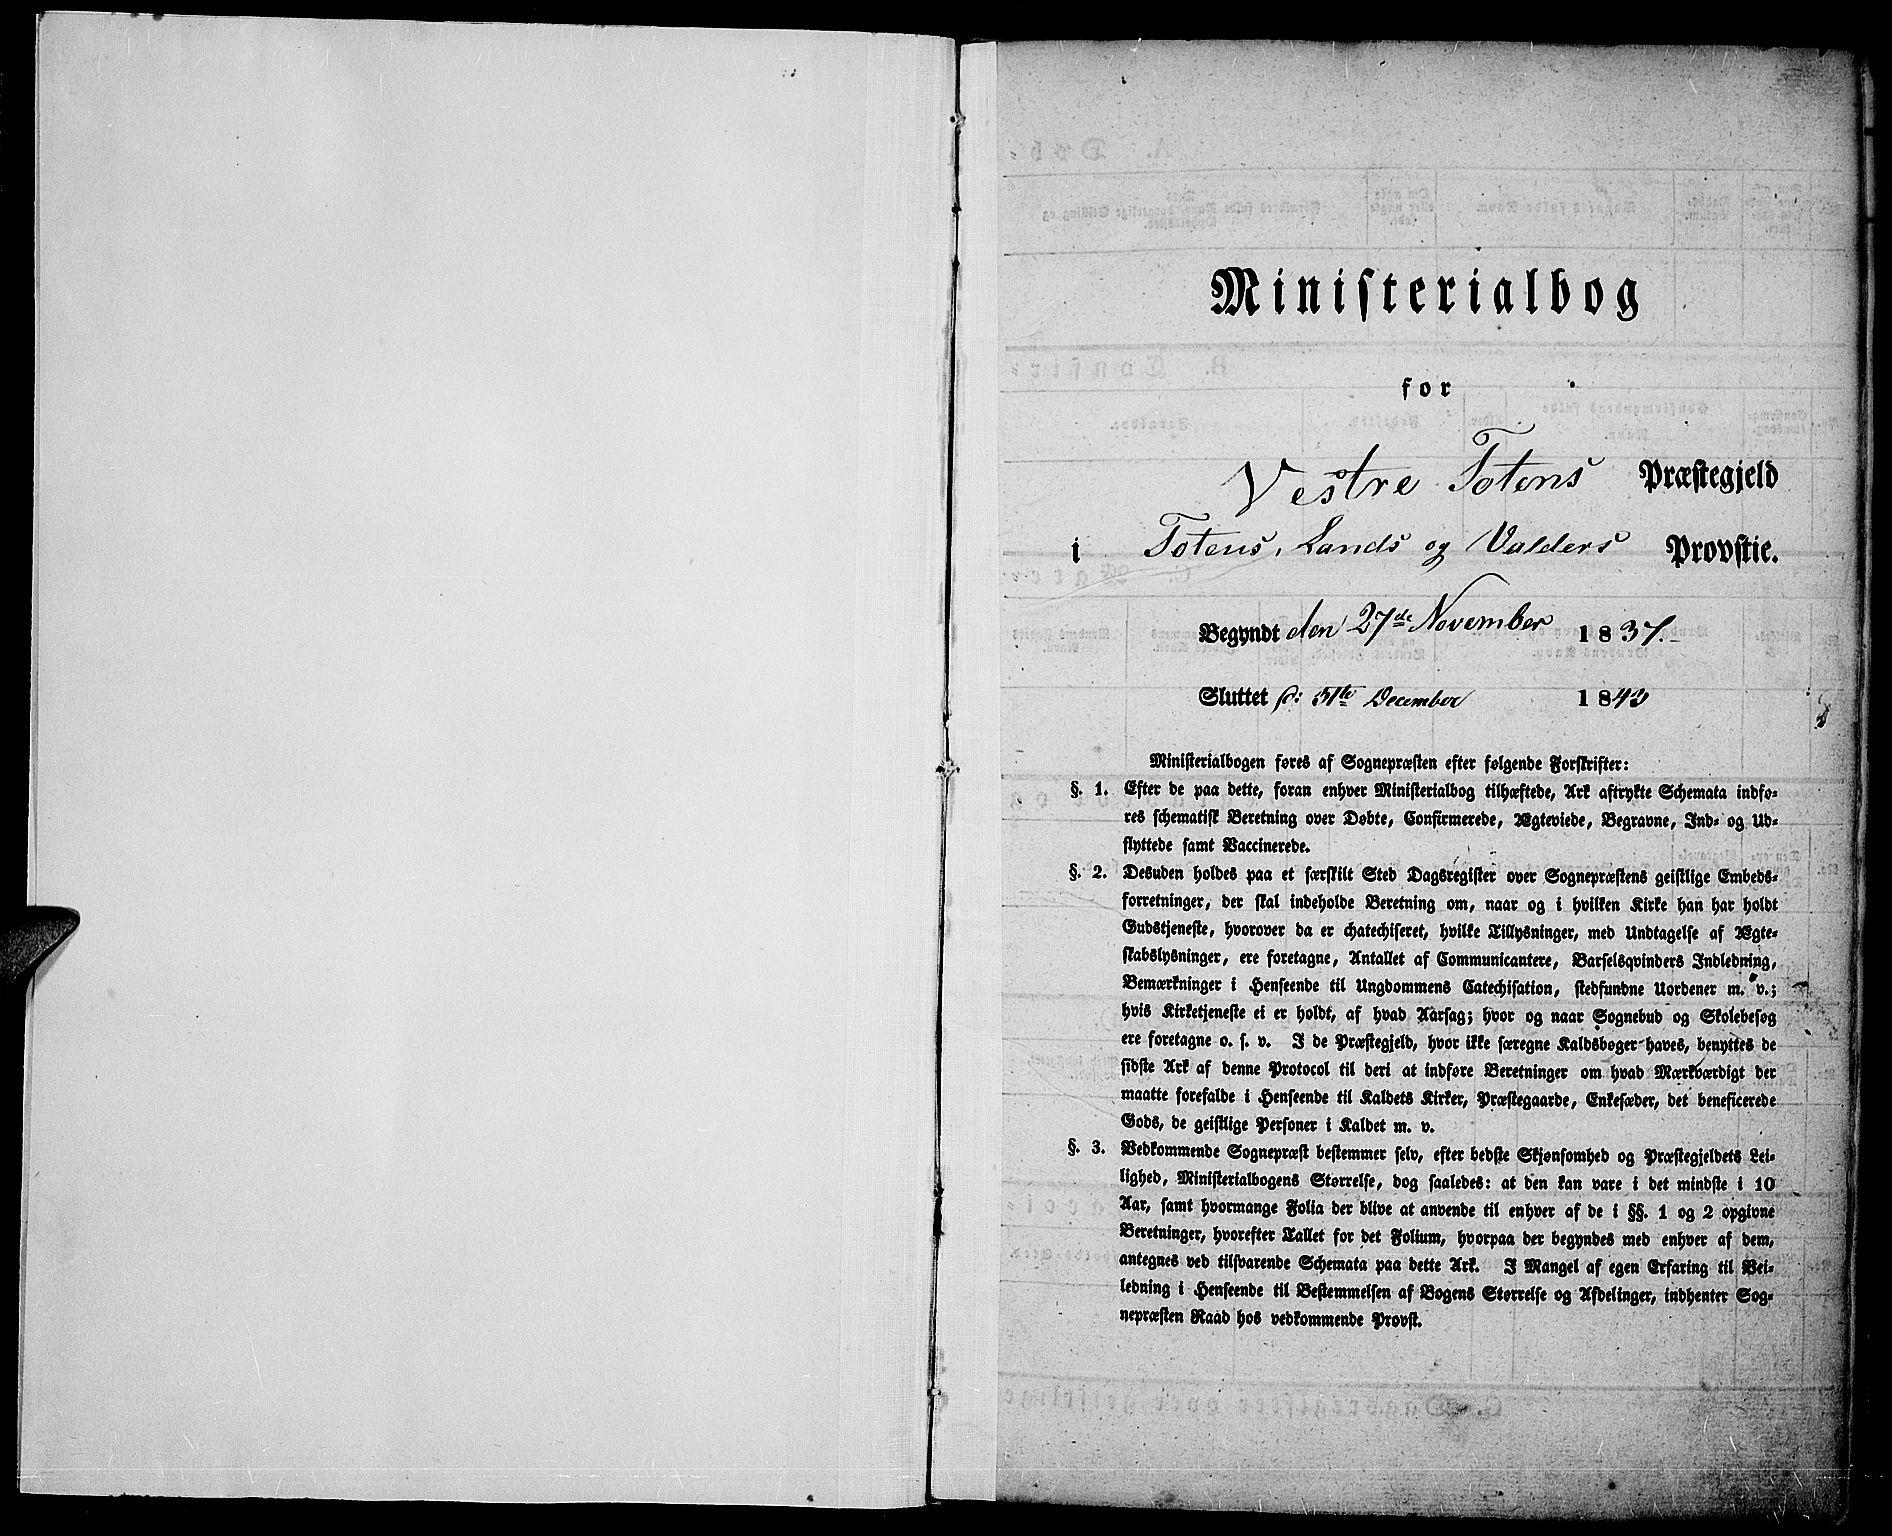 SAH, Vestre Toten prestekontor, H/Ha/Haa/L0003: Ministerialbok nr. 3, 1836-1843